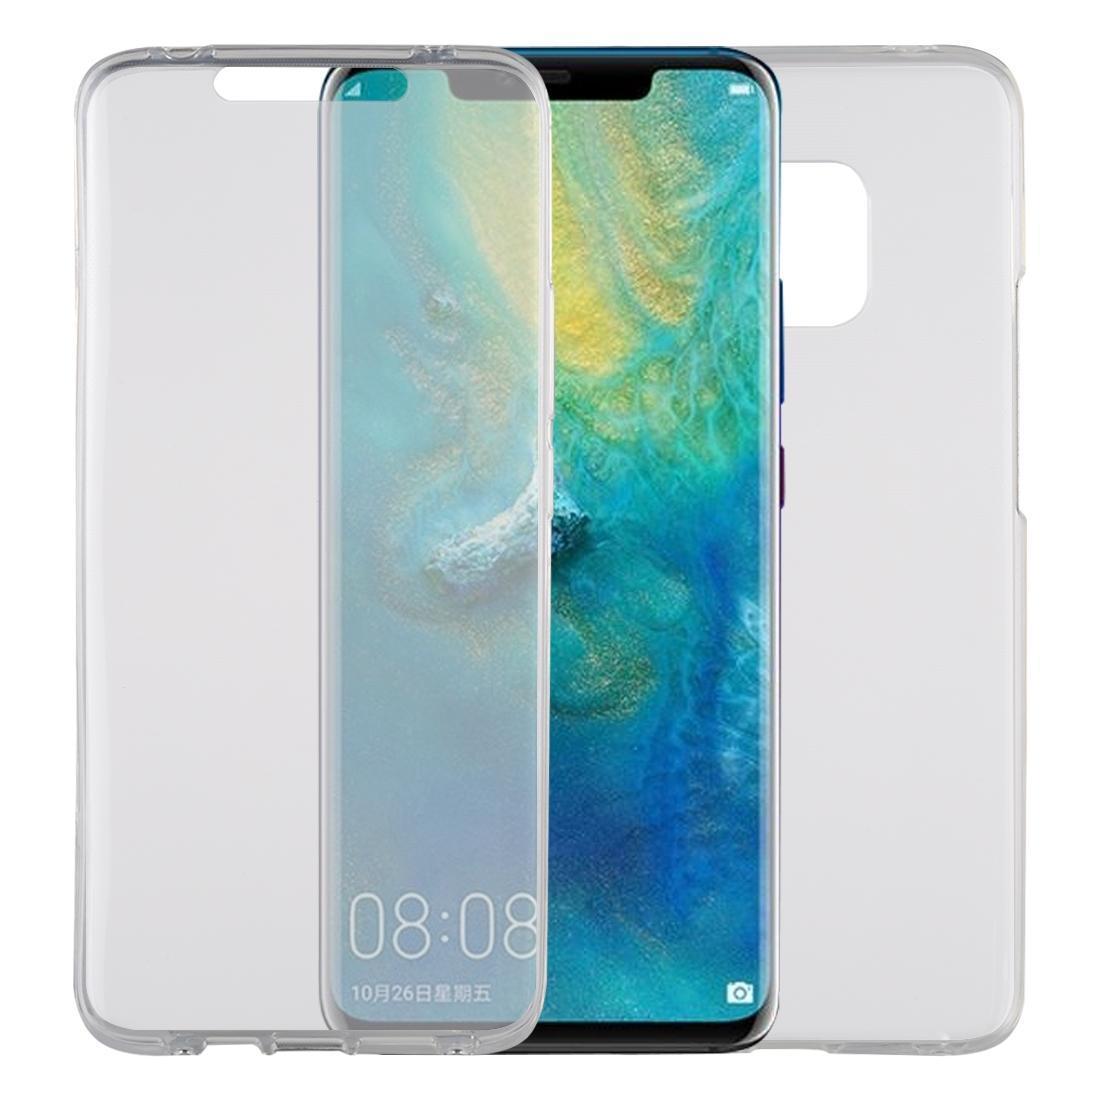 Caja protectora transparente TPU Cobertura completa ultra-delgada de doble cara para Huawei mate 20 Pro